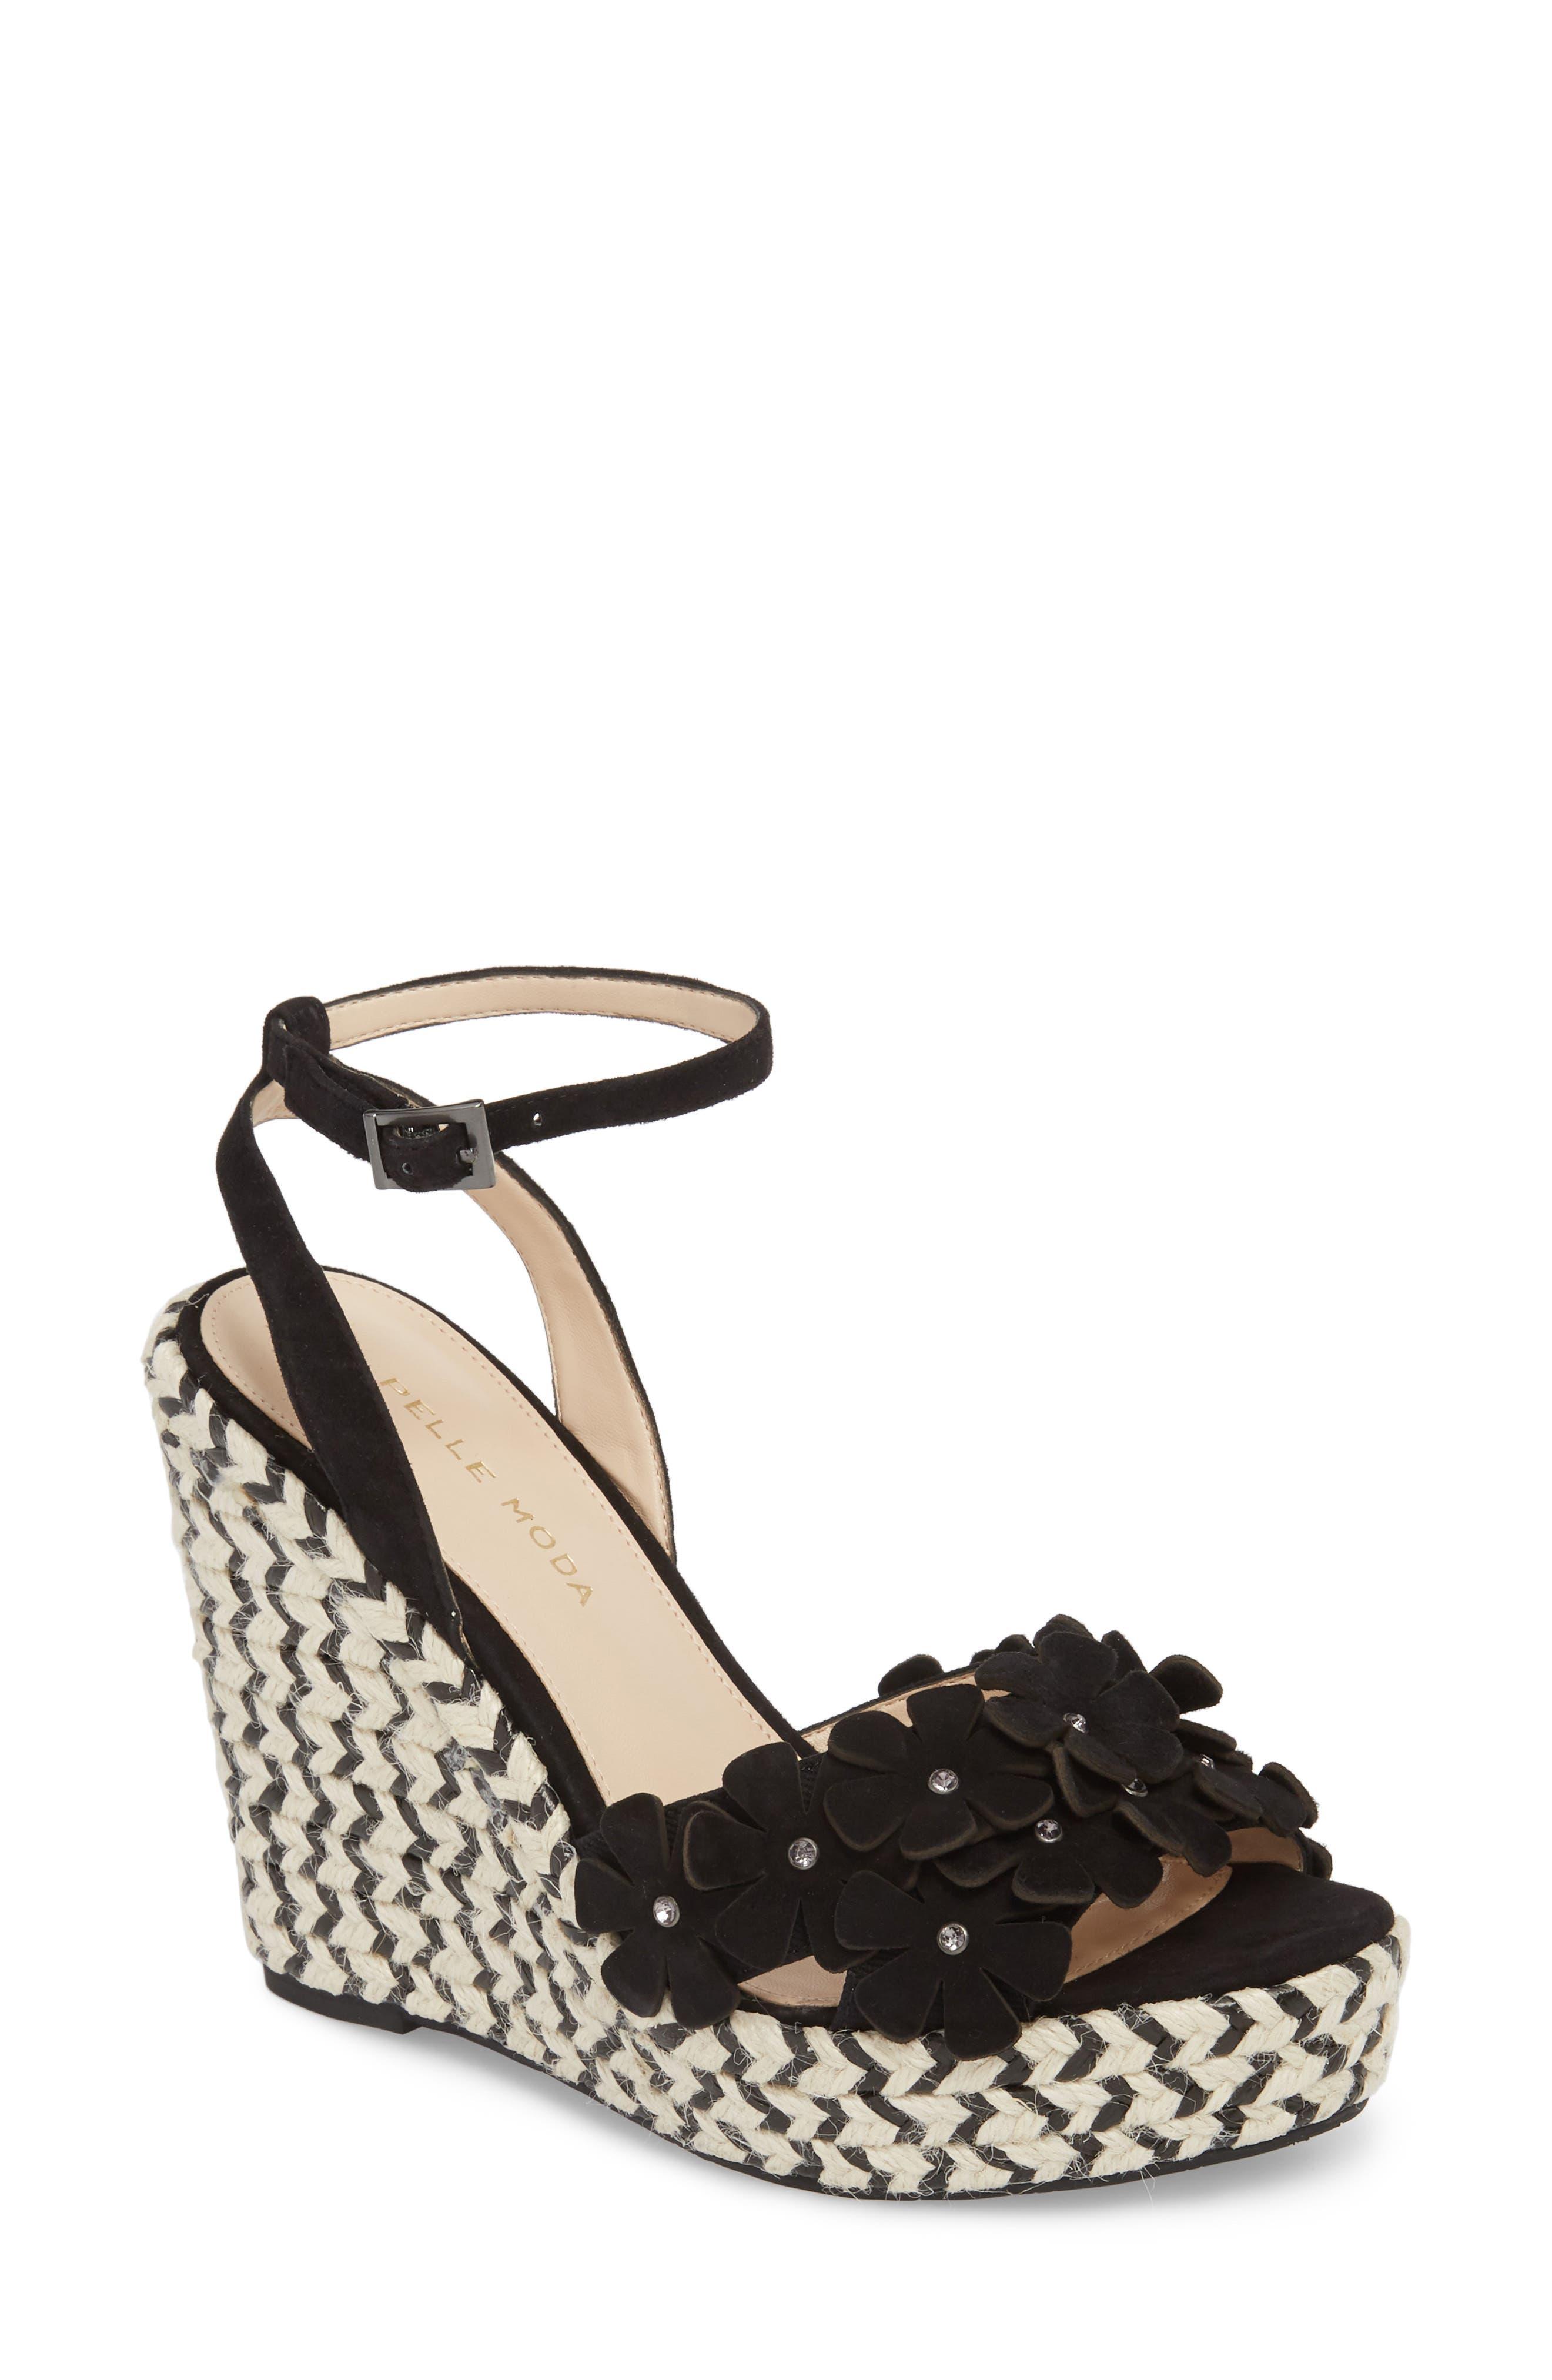 Waylin Espadrille Wedge Sandal,                         Main,                         color, Black Suede